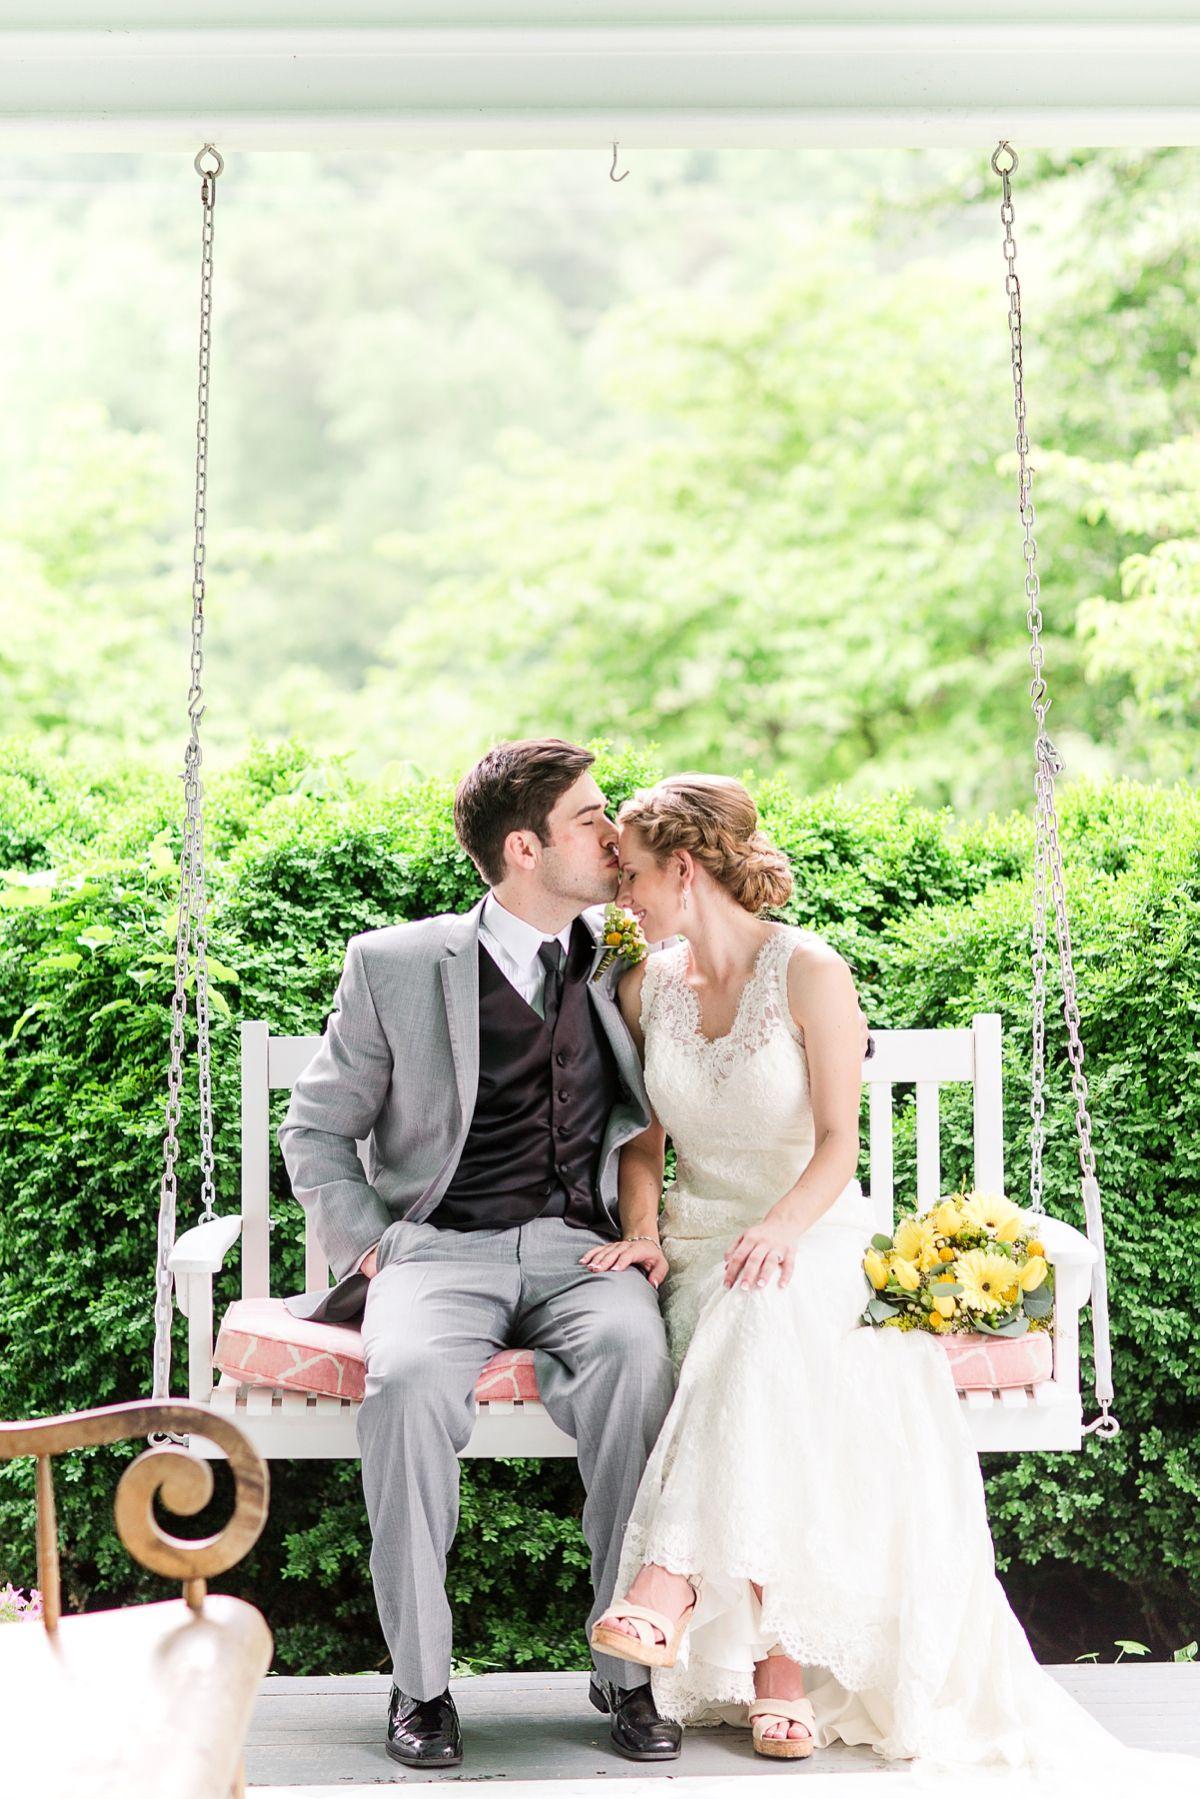 A Summer Sundara Wedding In Boones Mill Virginia Virginia Wedding Photographer Kat Virginia Wedding Photographer Virginia Wedding Venues Virginia Weddings